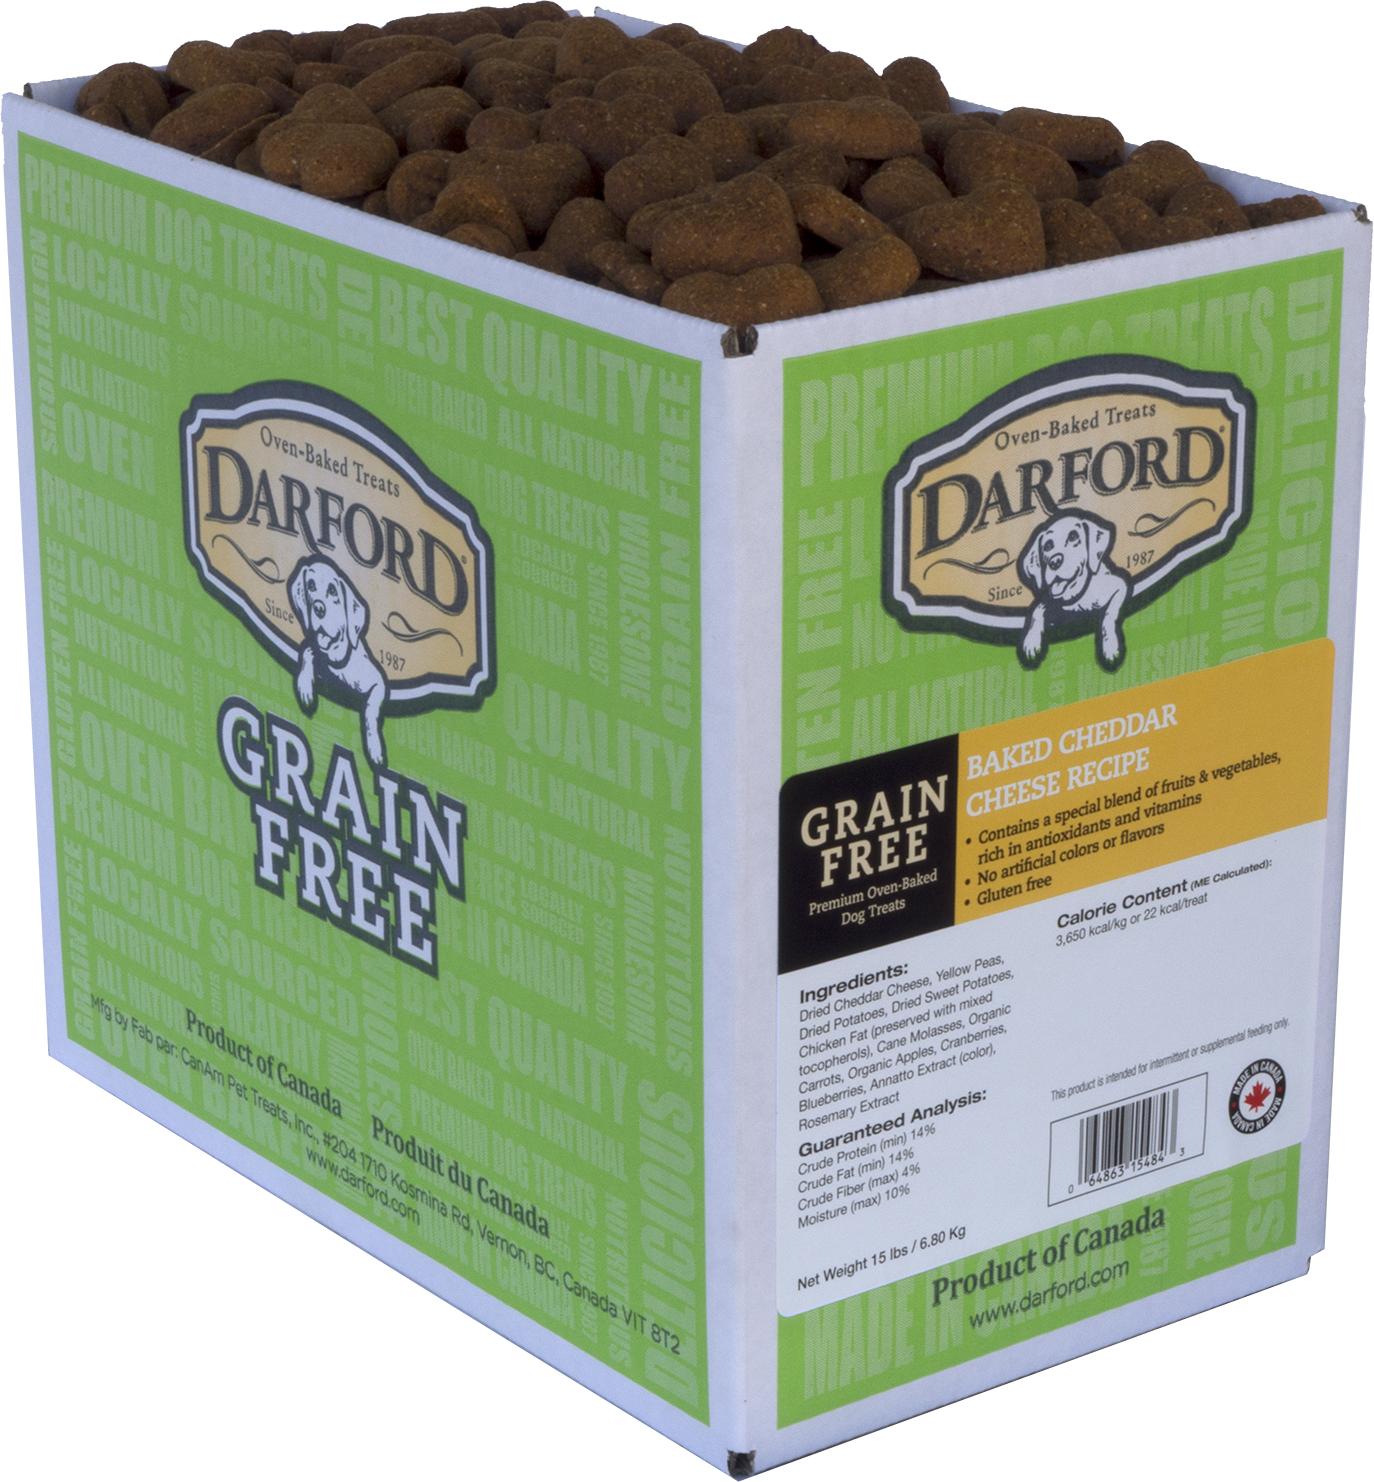 Darford Baked Cheddar Cheese Recipe Grain-Free Mini Dog Treats, 15-lb box